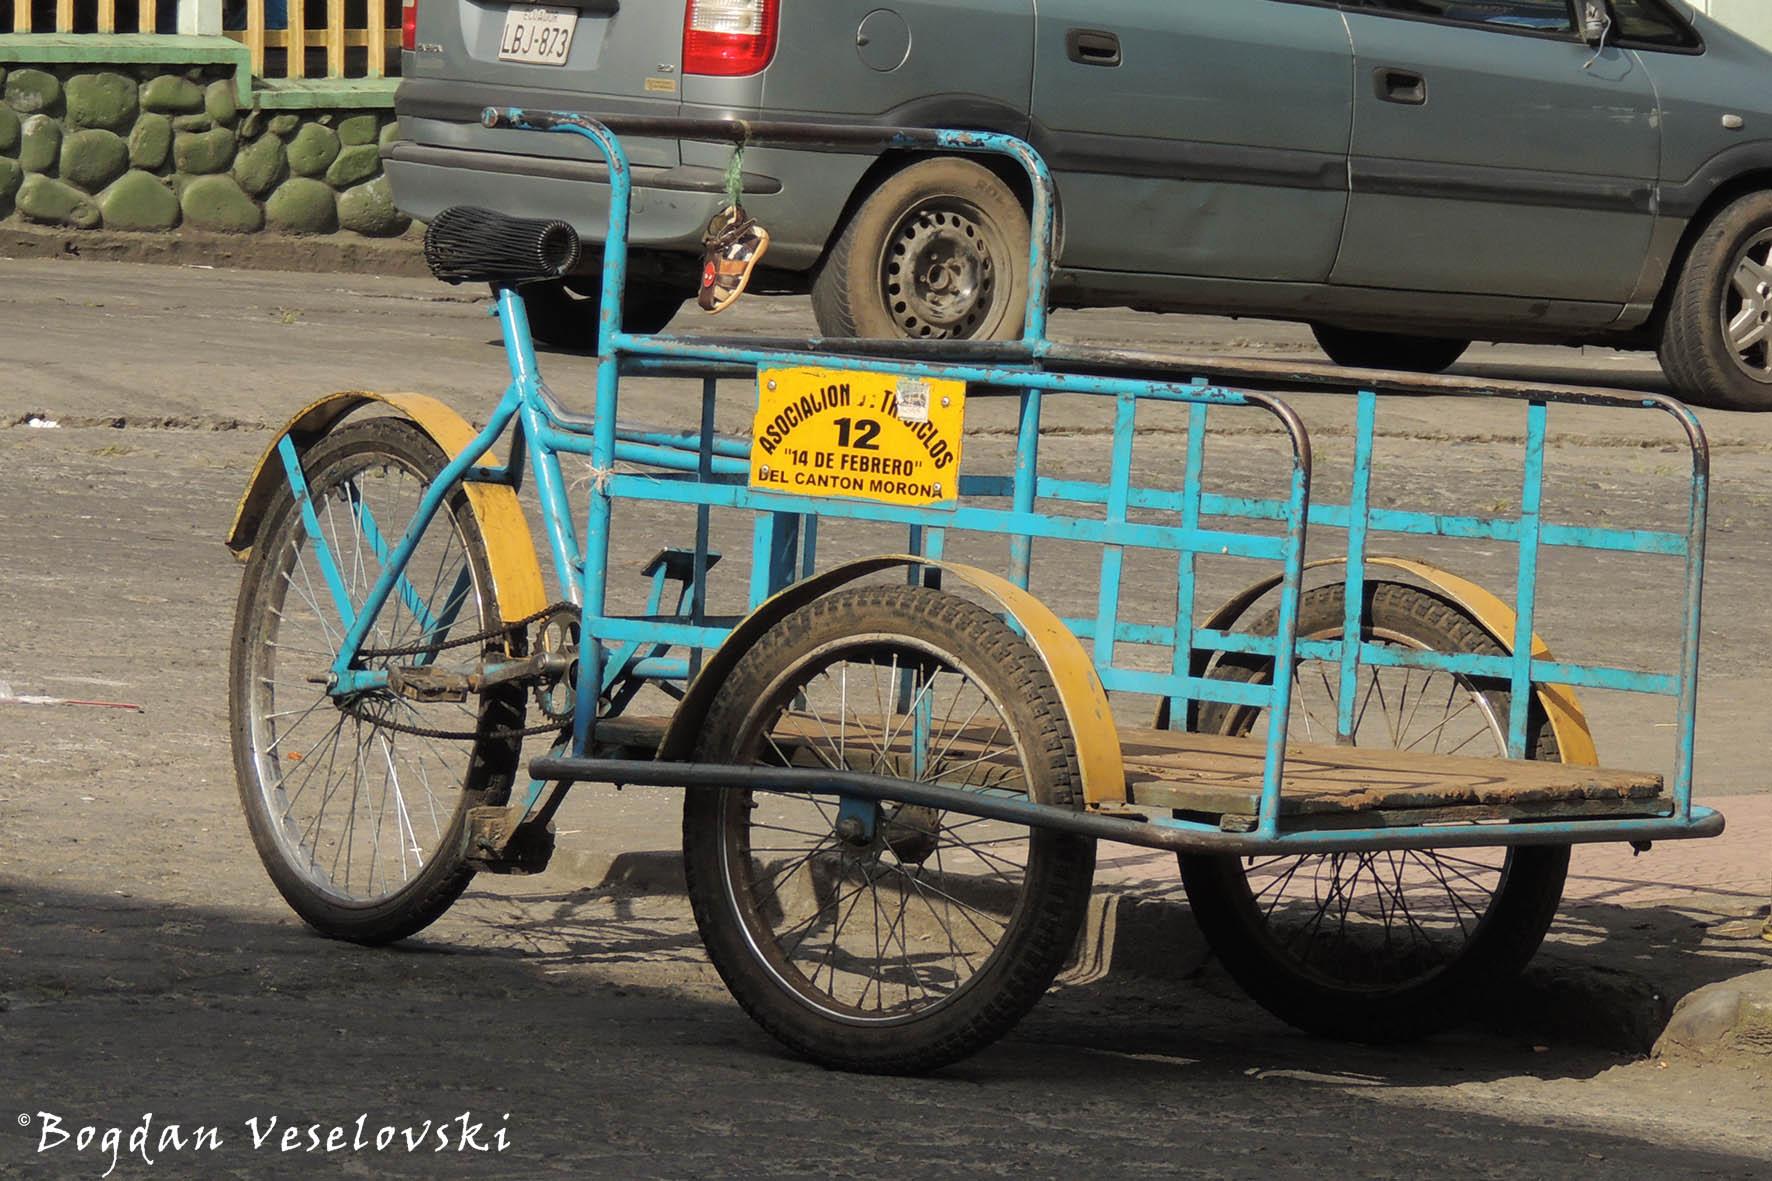 Transportation in Ecuador